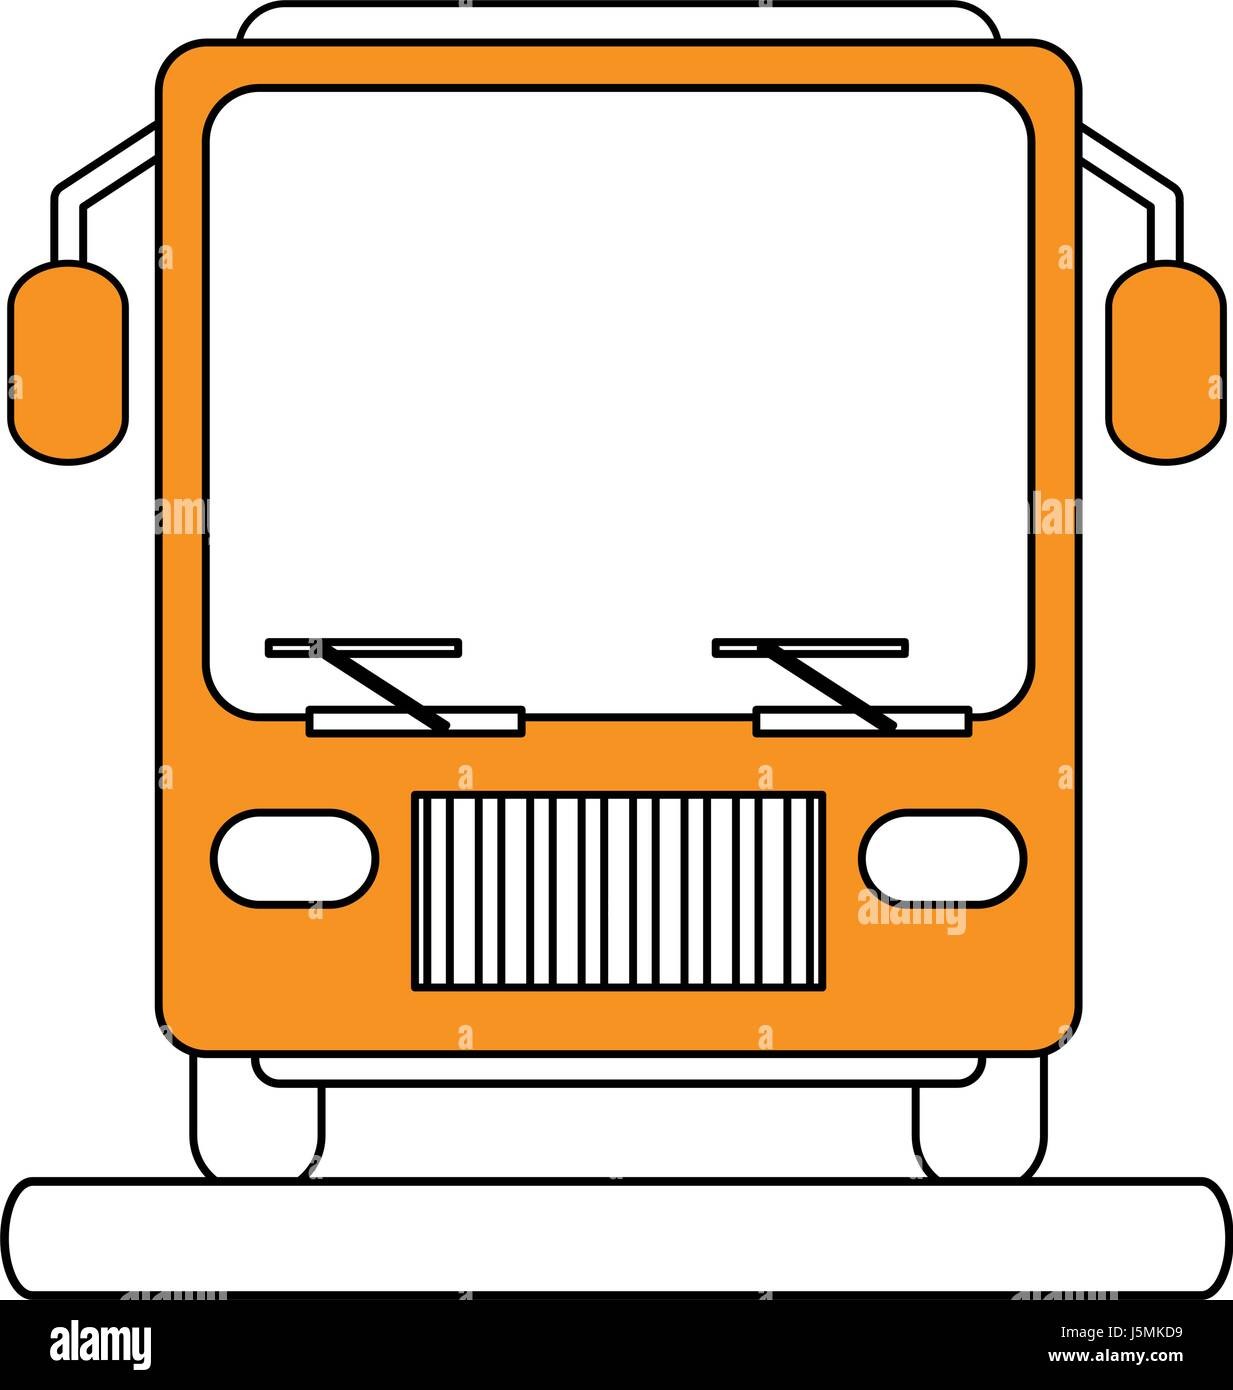 color silhouette image front view public service bus - Stock Image